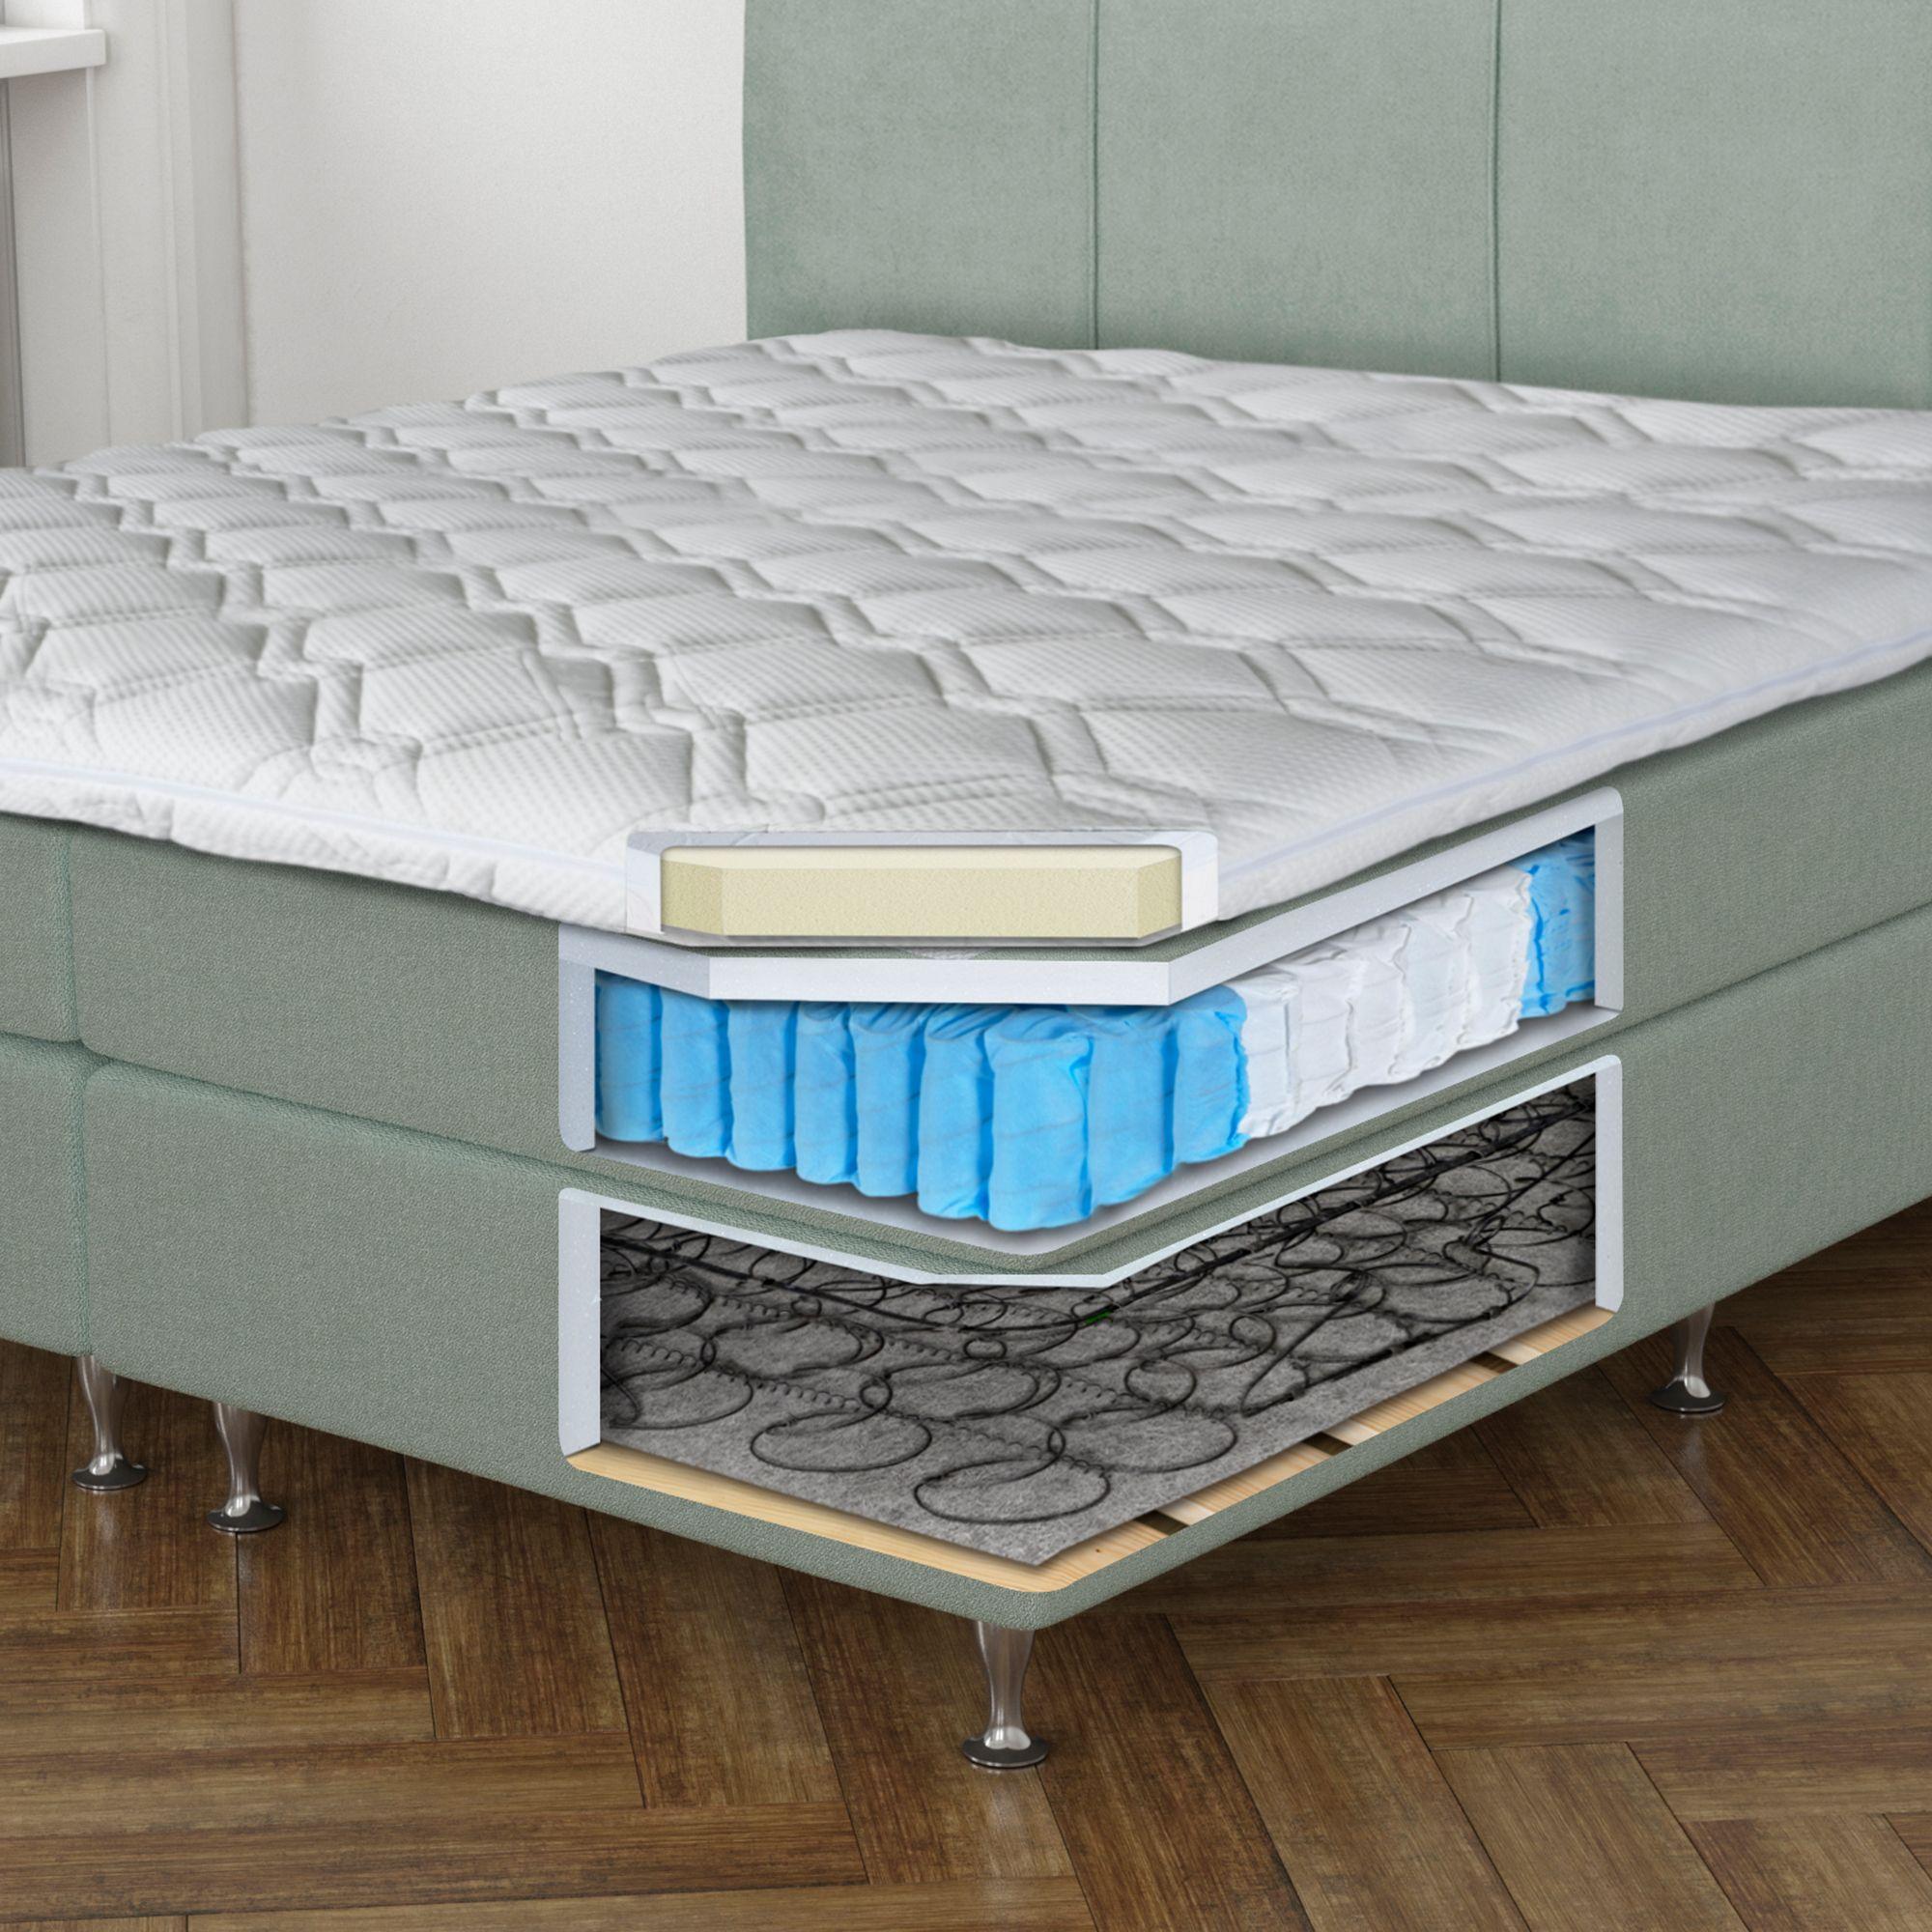 bodyflex boxspring bett valencia serie classic softschaum topper metallf e page 1. Black Bedroom Furniture Sets. Home Design Ideas